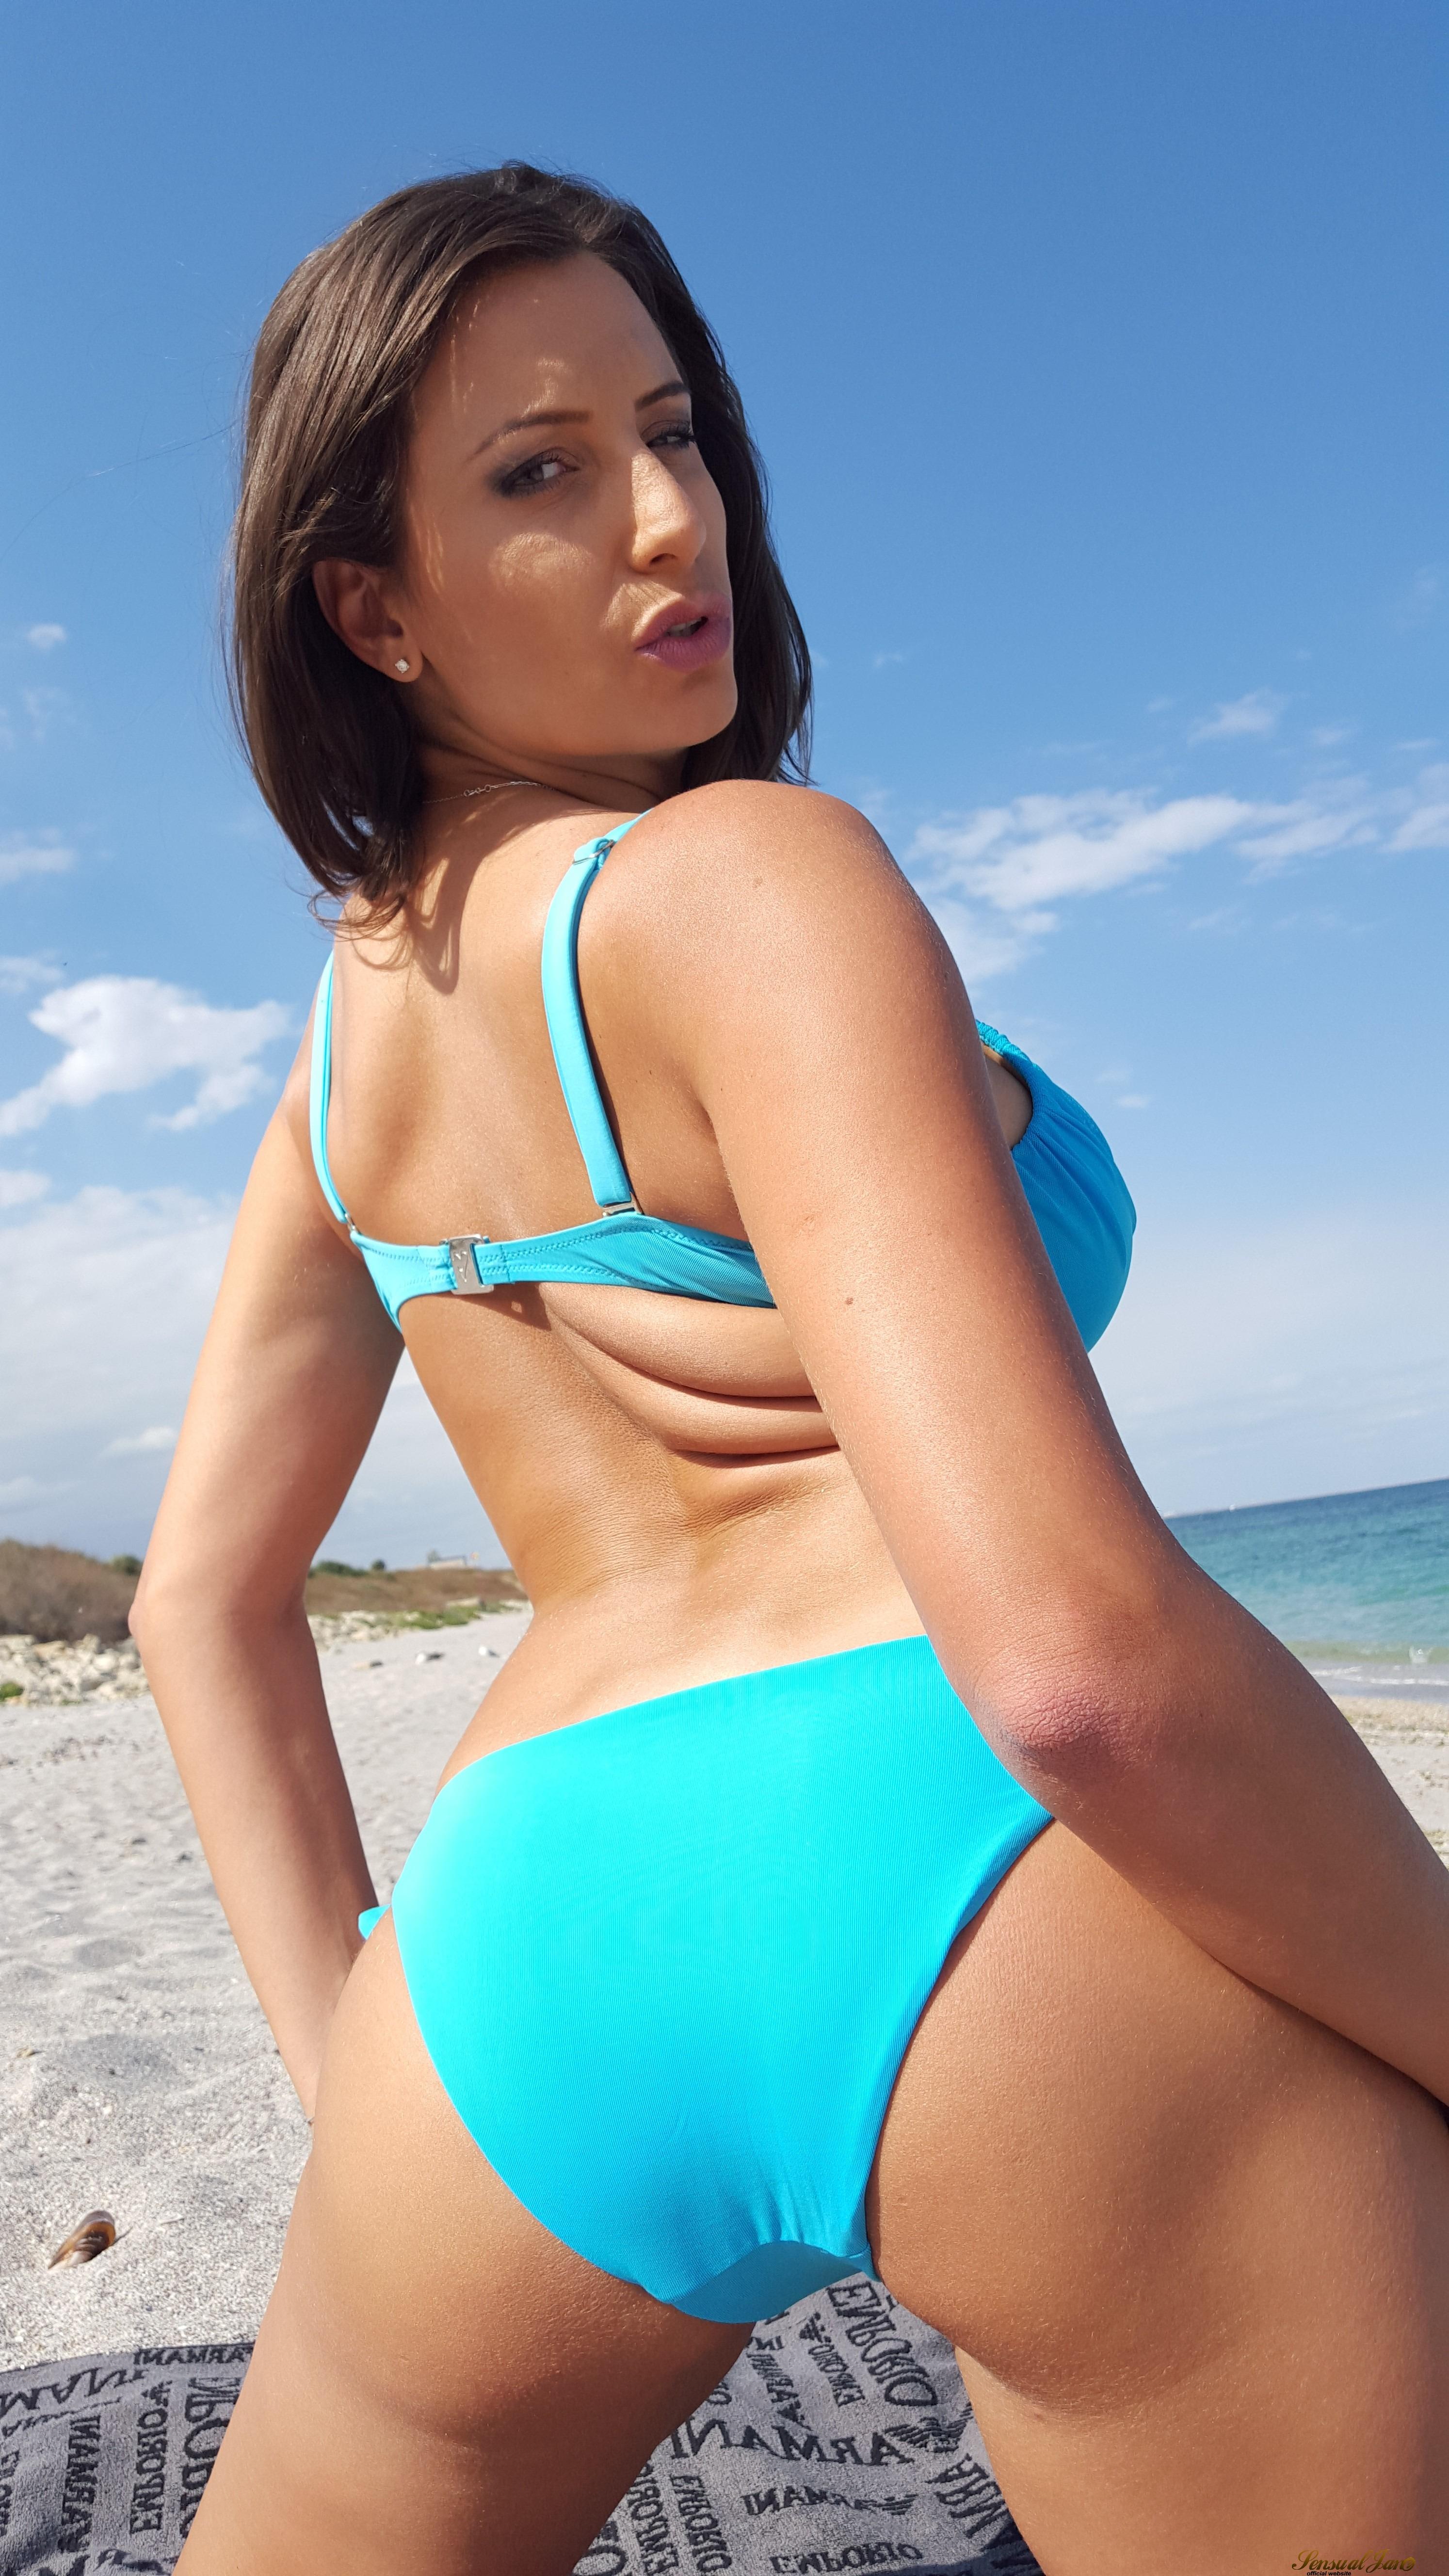 Sensual Jane Big Tits Blue Bikini